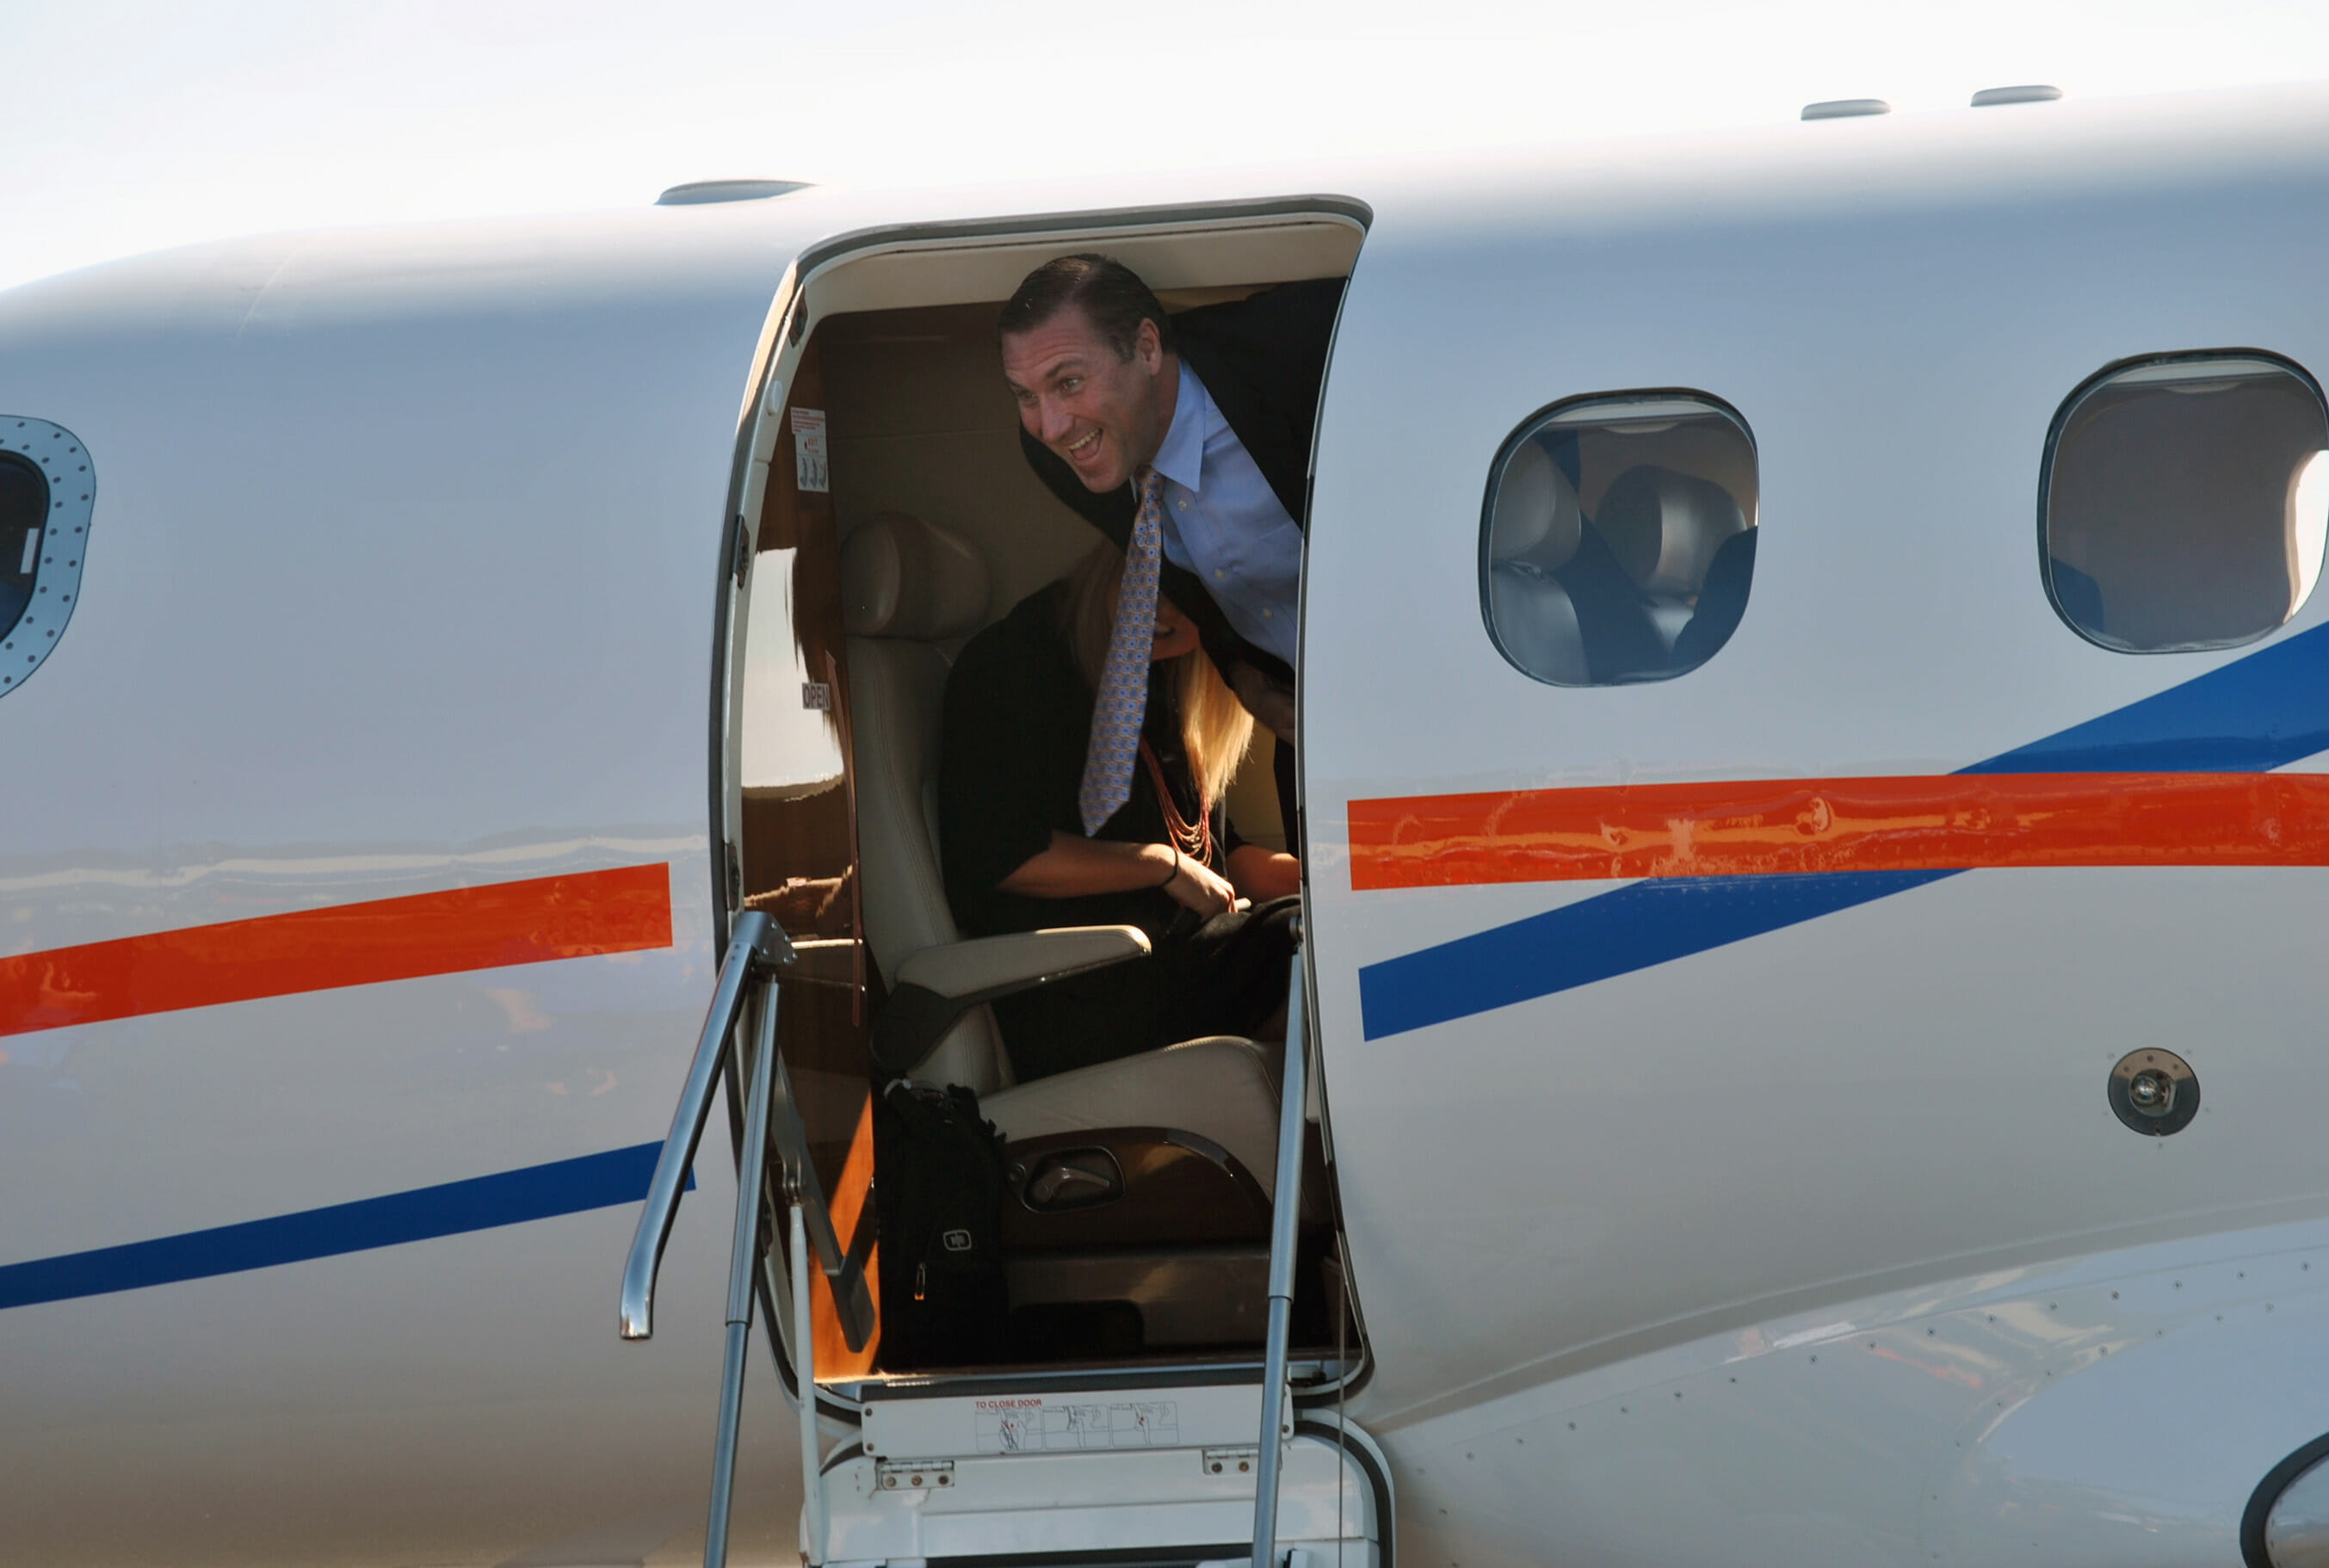 Dan Mullen's arrival